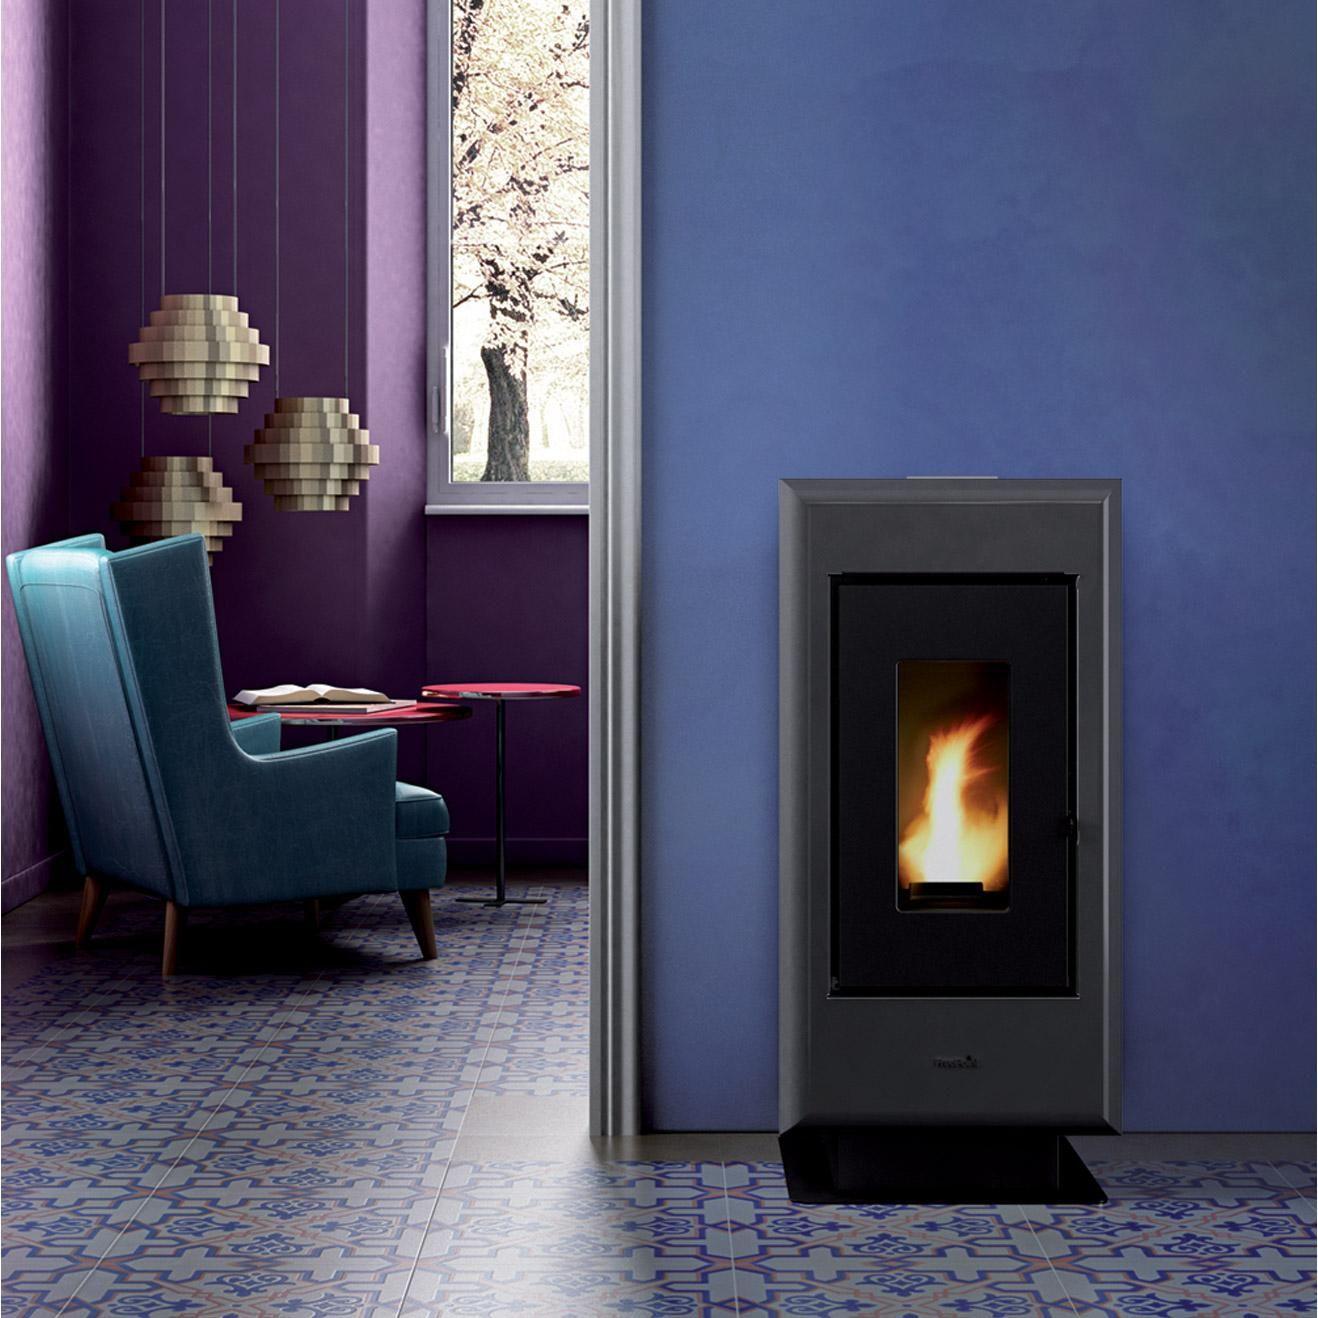 Poele A Granules Freepoint Elan Evo Noir 6 5 Kw En 2020 Decoration Maison Poele A Granules Et Elan